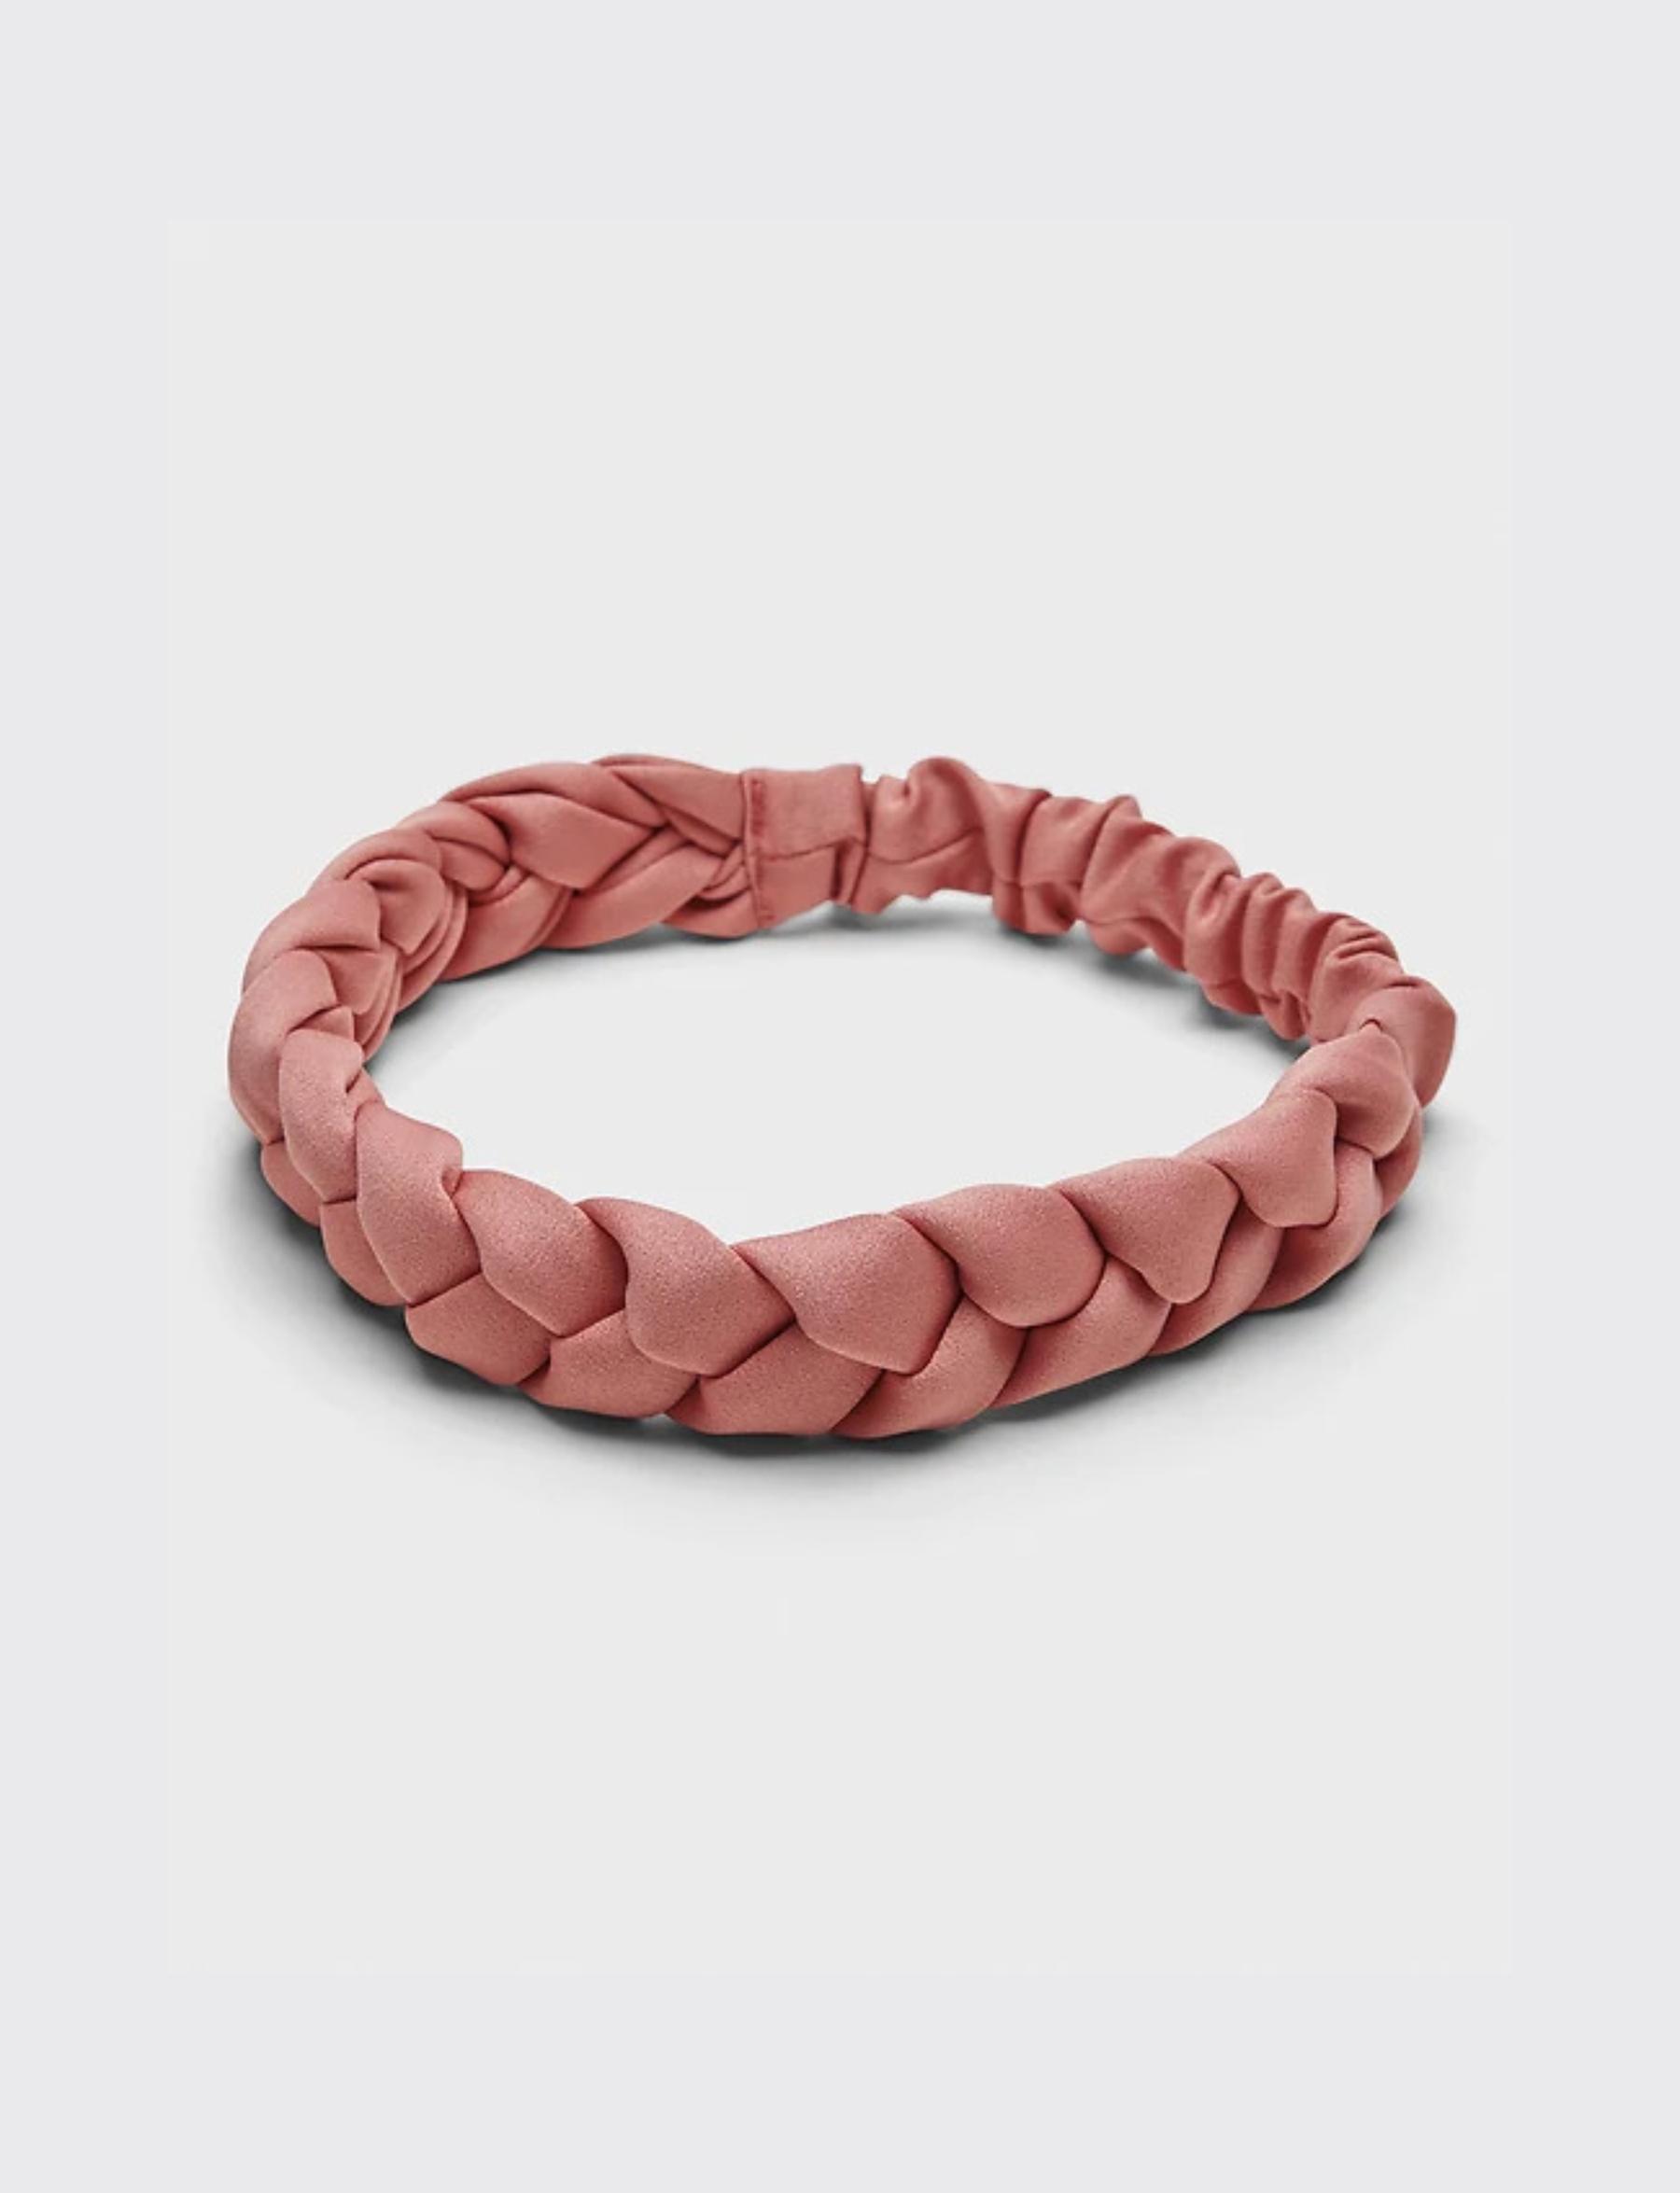 Braided Headwrap - Coral